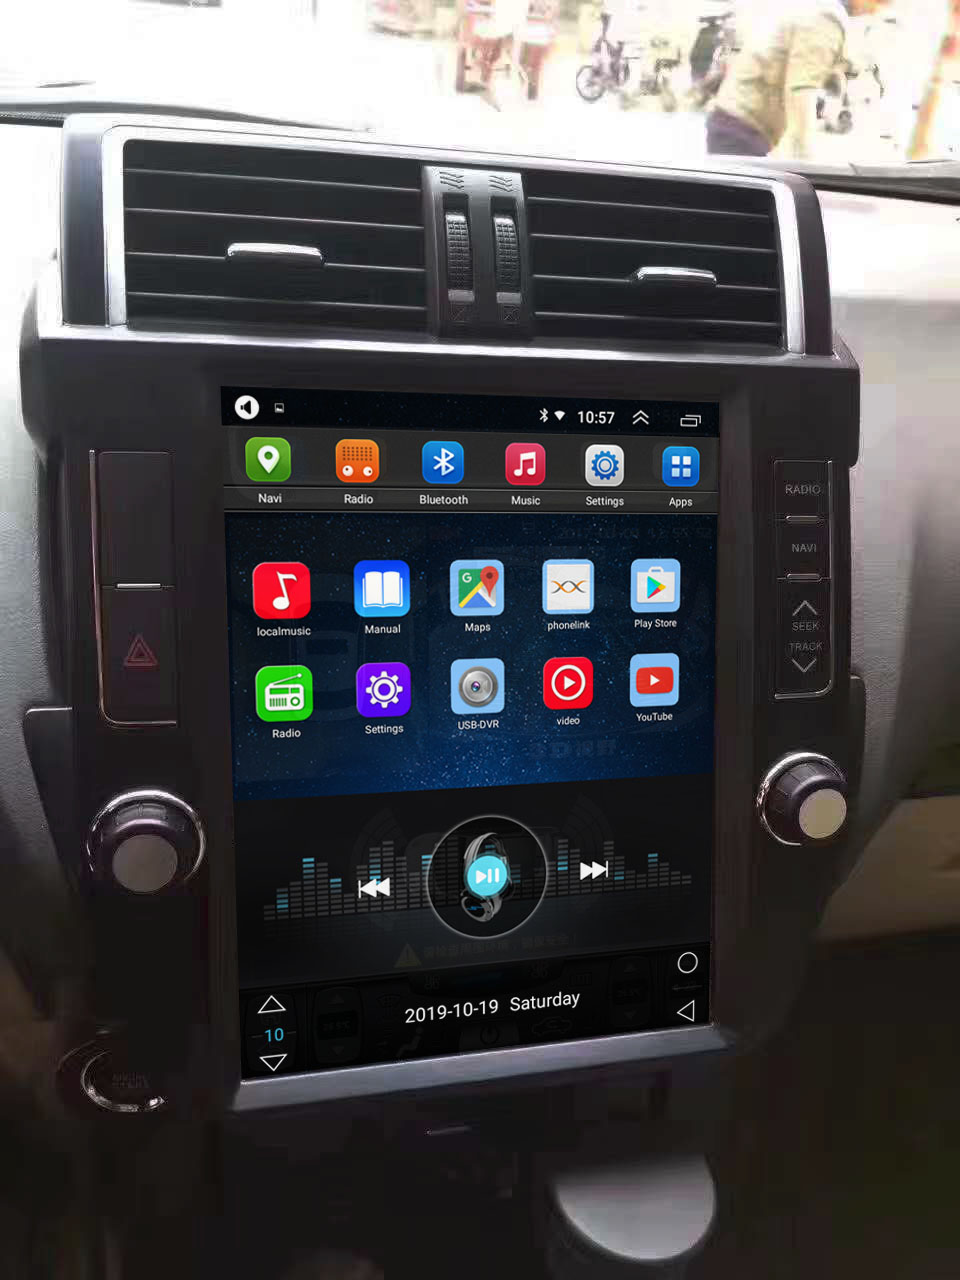 Tesla Style 12.1 Inch Android Car Multimedia Navigation For Toyota Prado 2014-2017